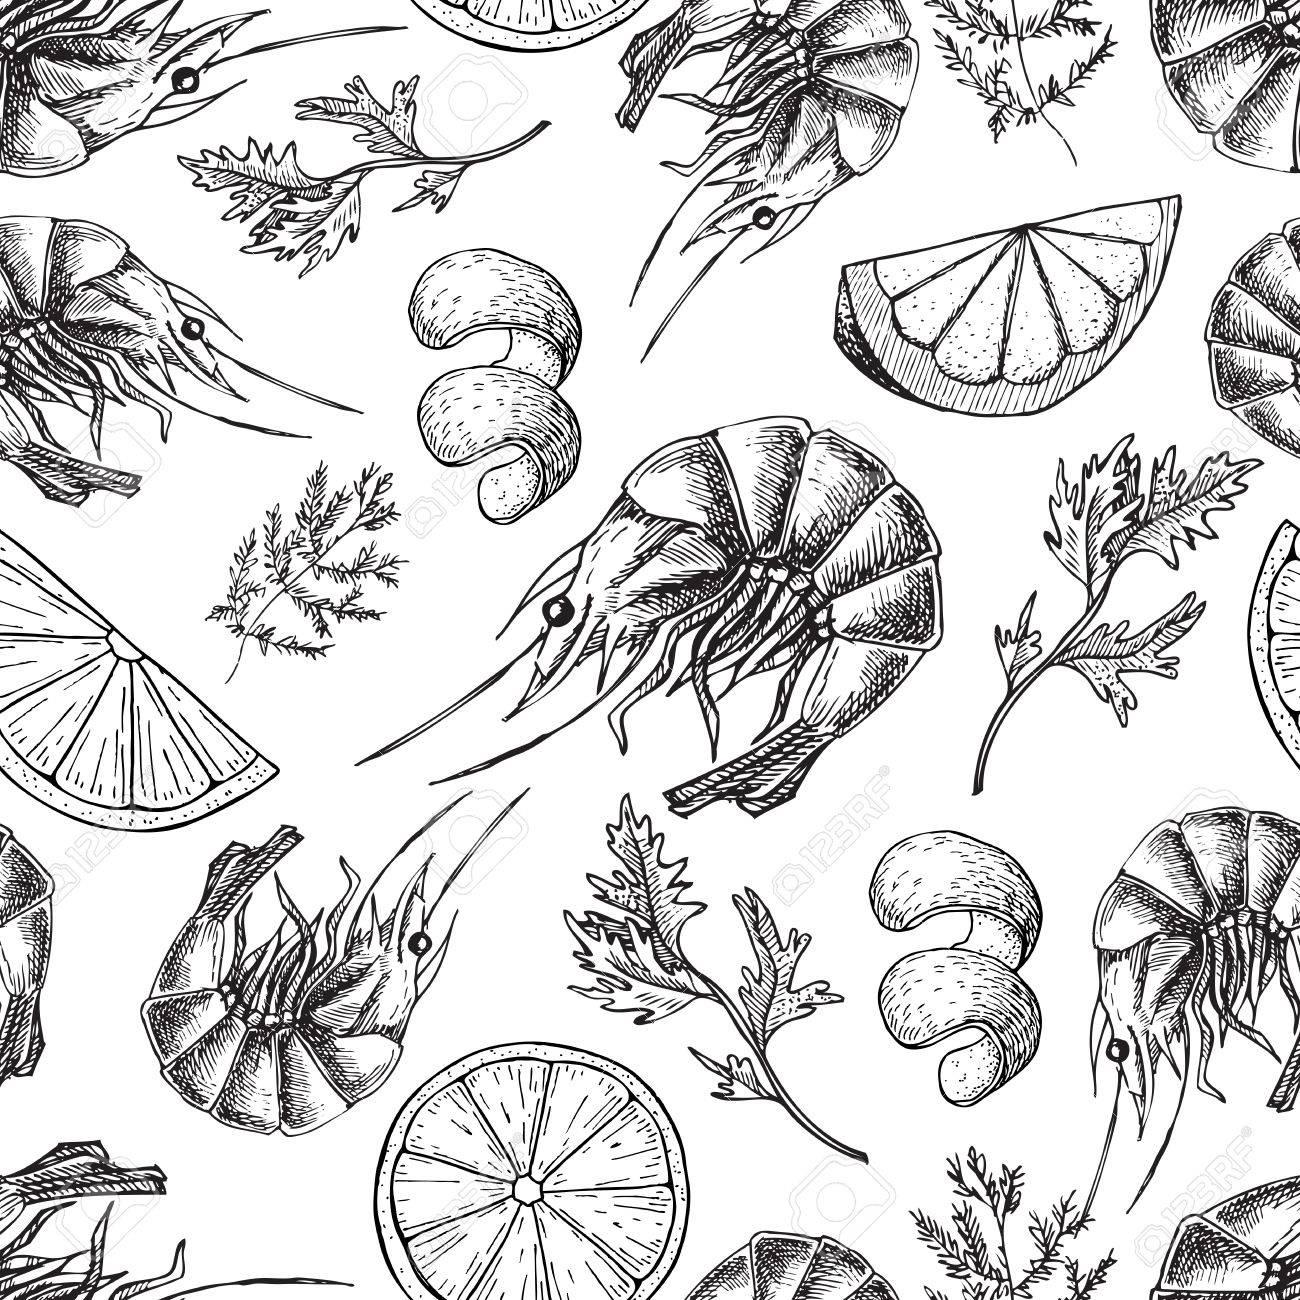 1300x1300 Shrimp Vector Drawing. Seamless Seafood Pattern. Shrimp Food